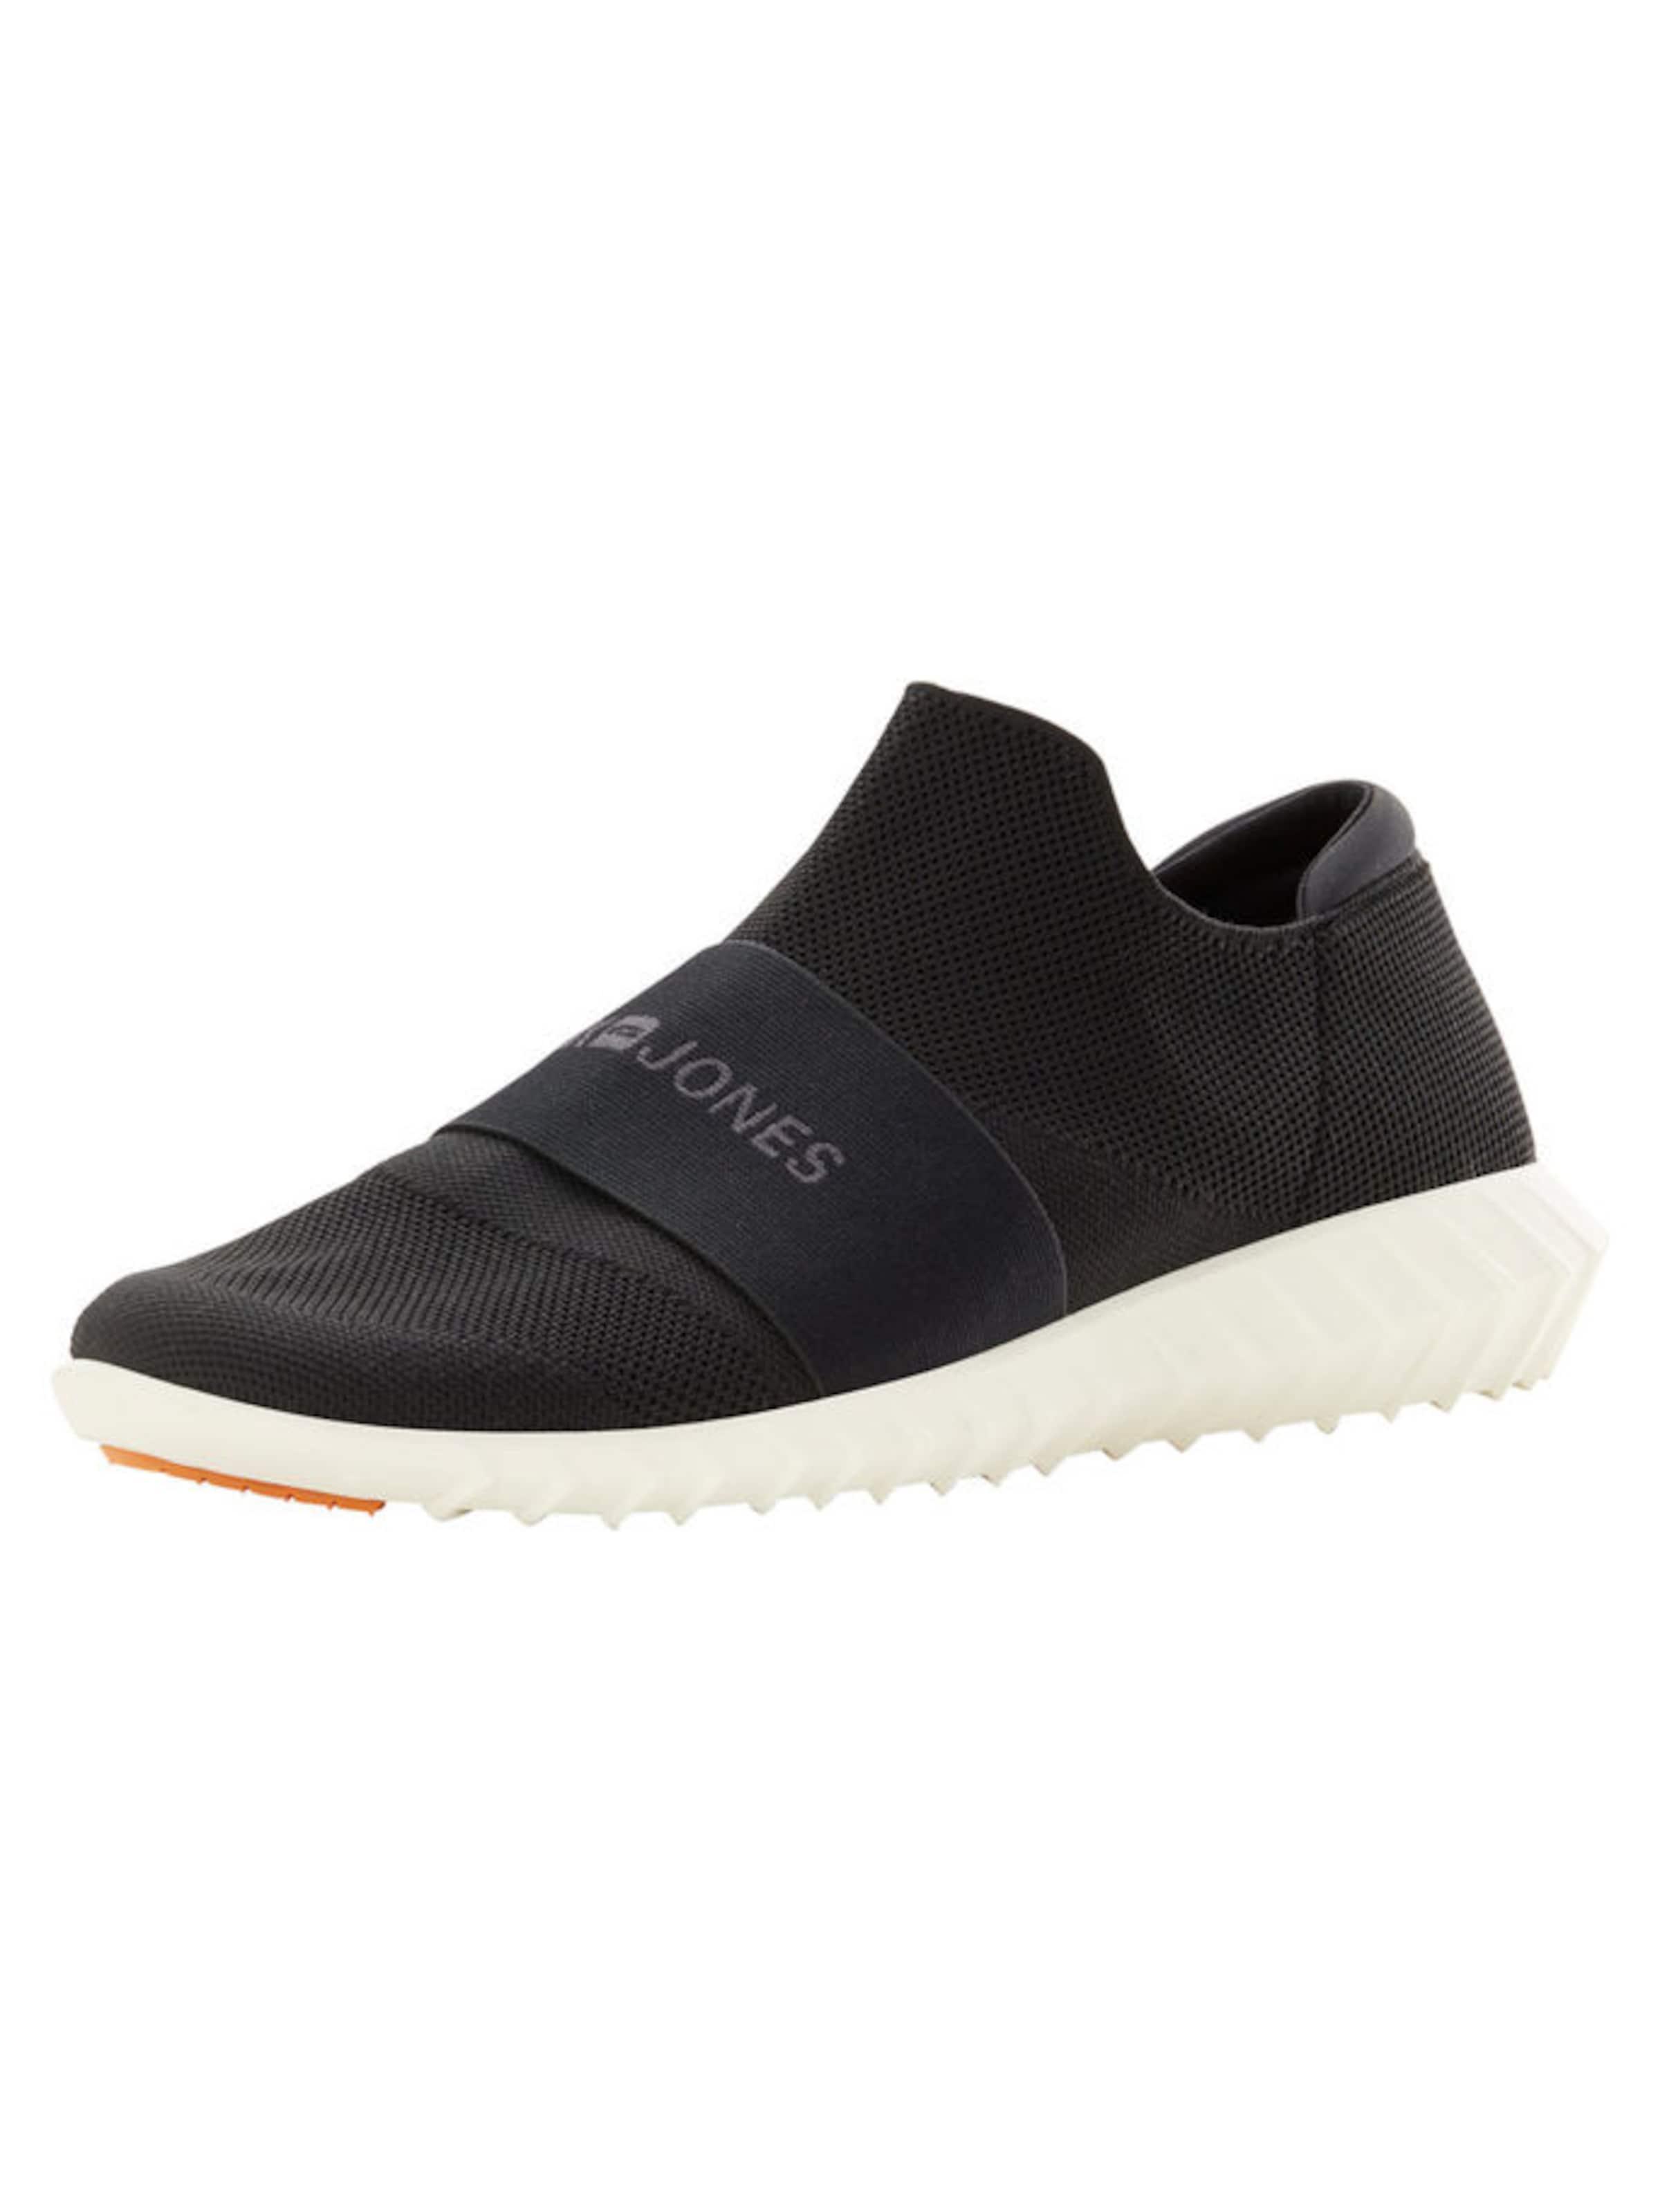 JACK & JONES Strick Sneaker Hohe Qualität